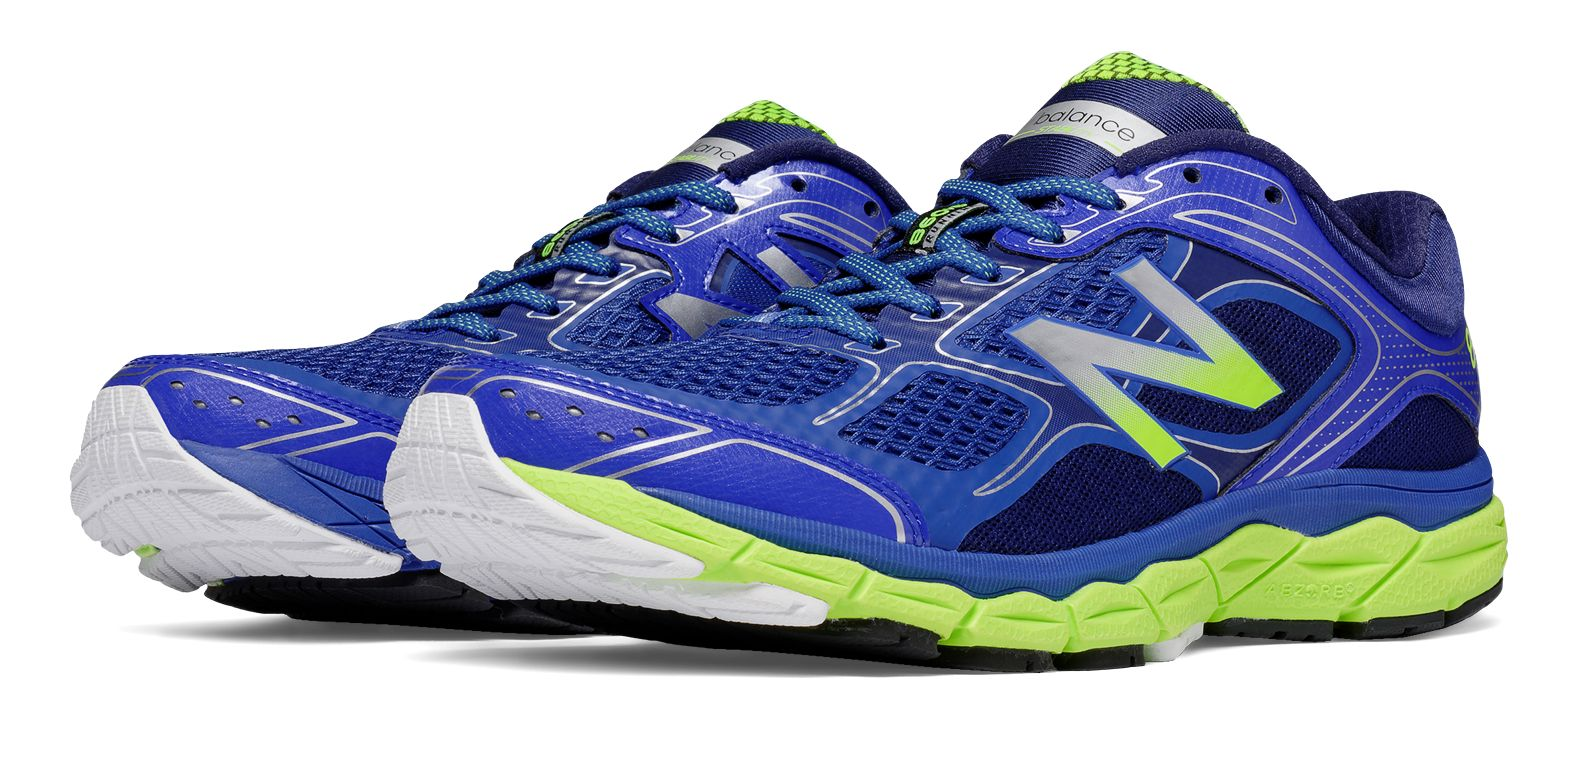 finest selection 7eae4 4babf Fitness Mania – New Balance 860v6 Men s Running Shoes – M860BB6